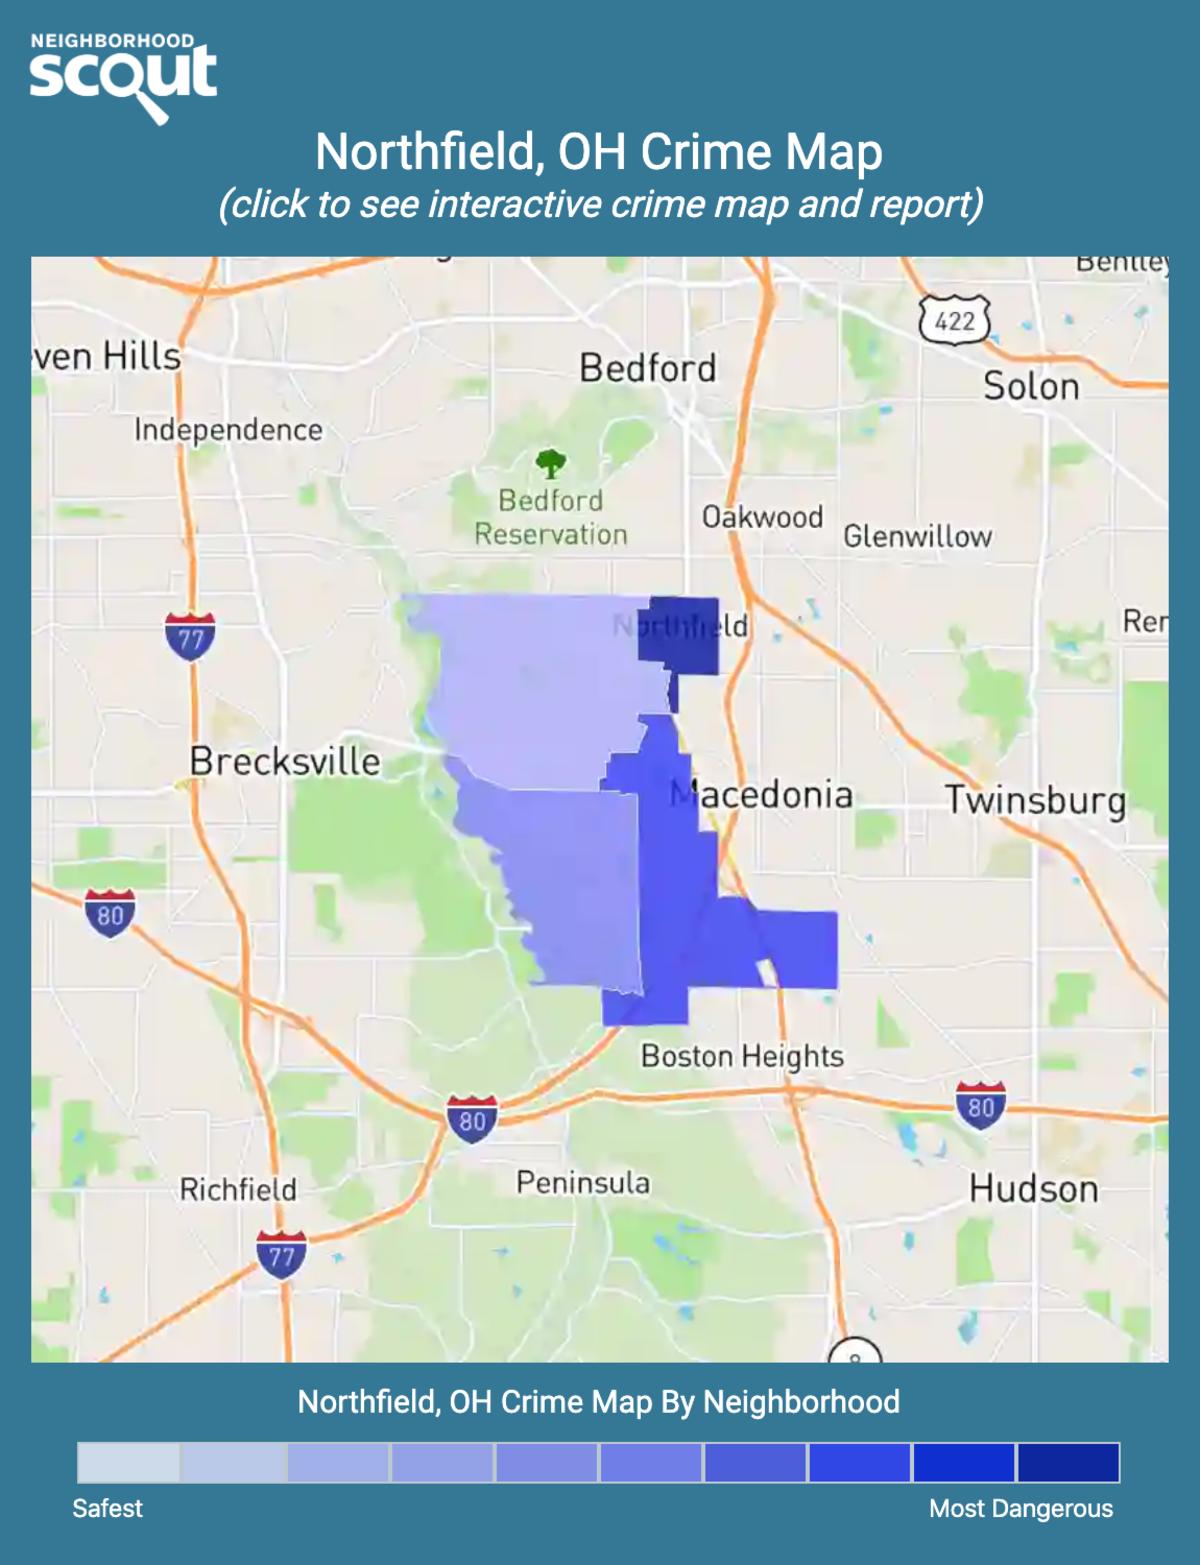 Northfield, Ohio crime map